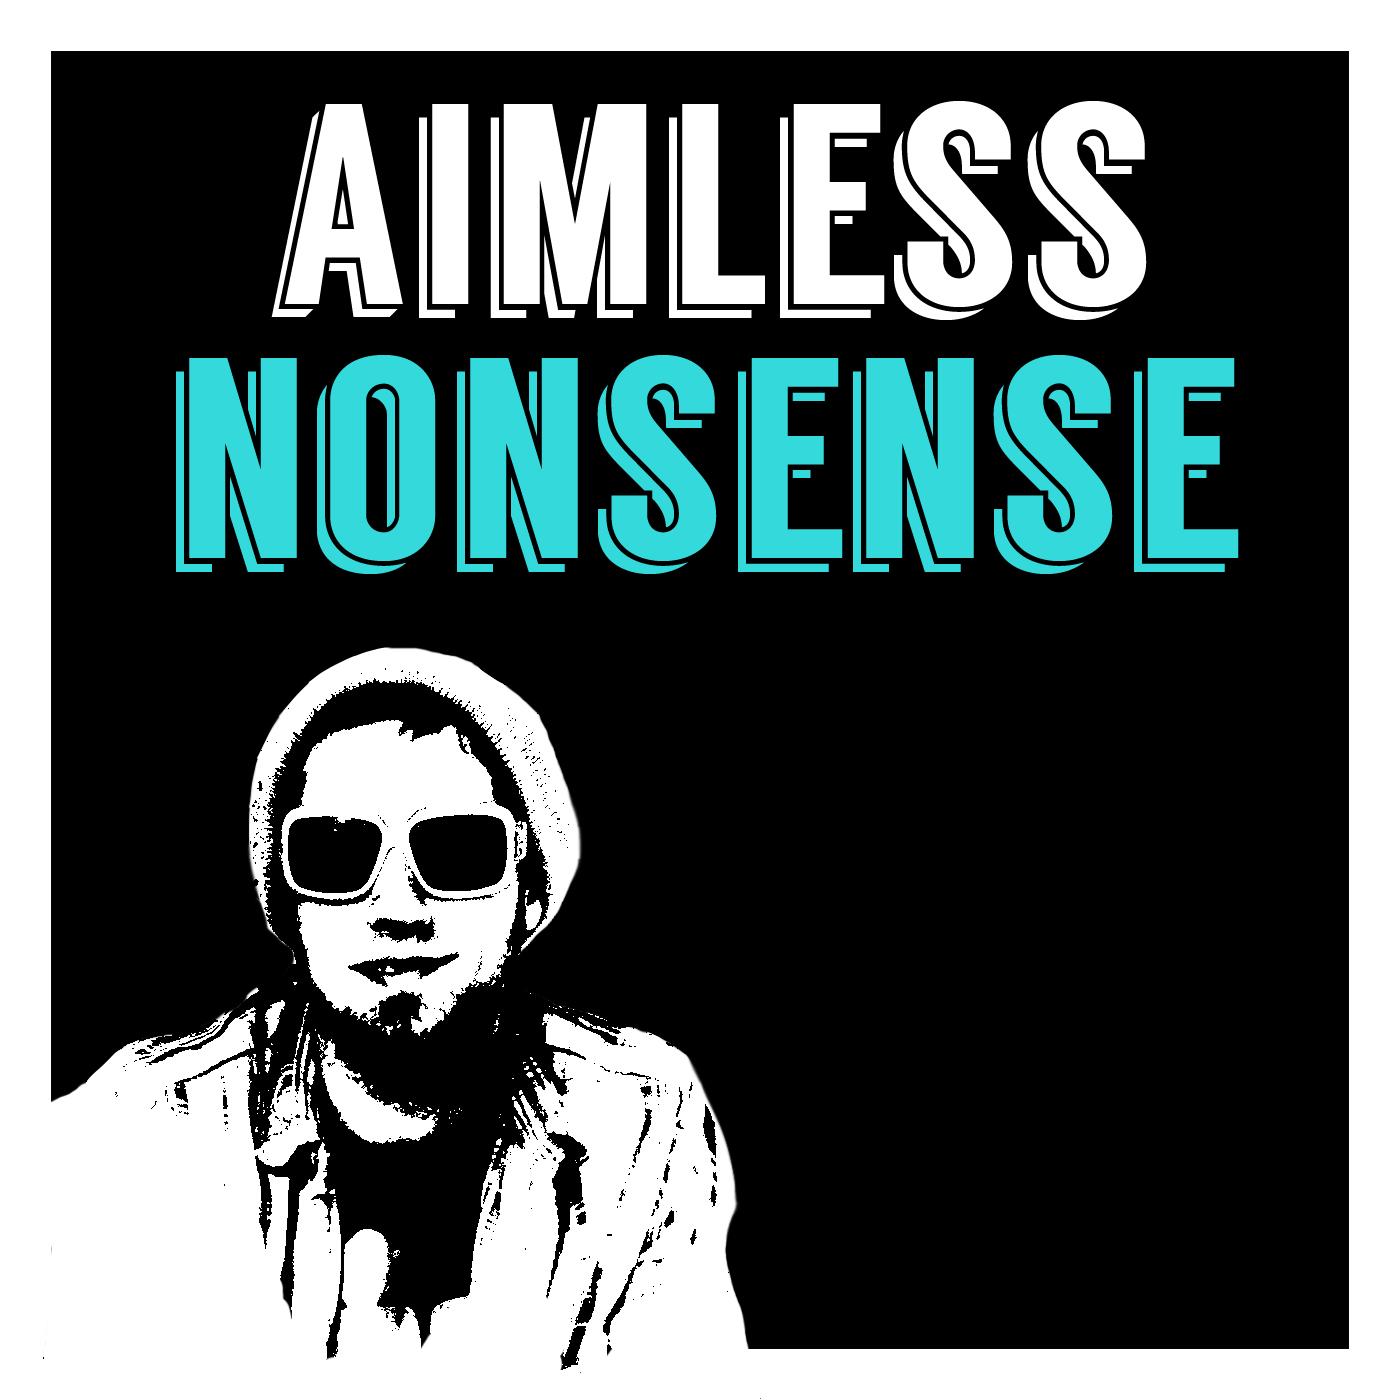 Aimless Nonsense